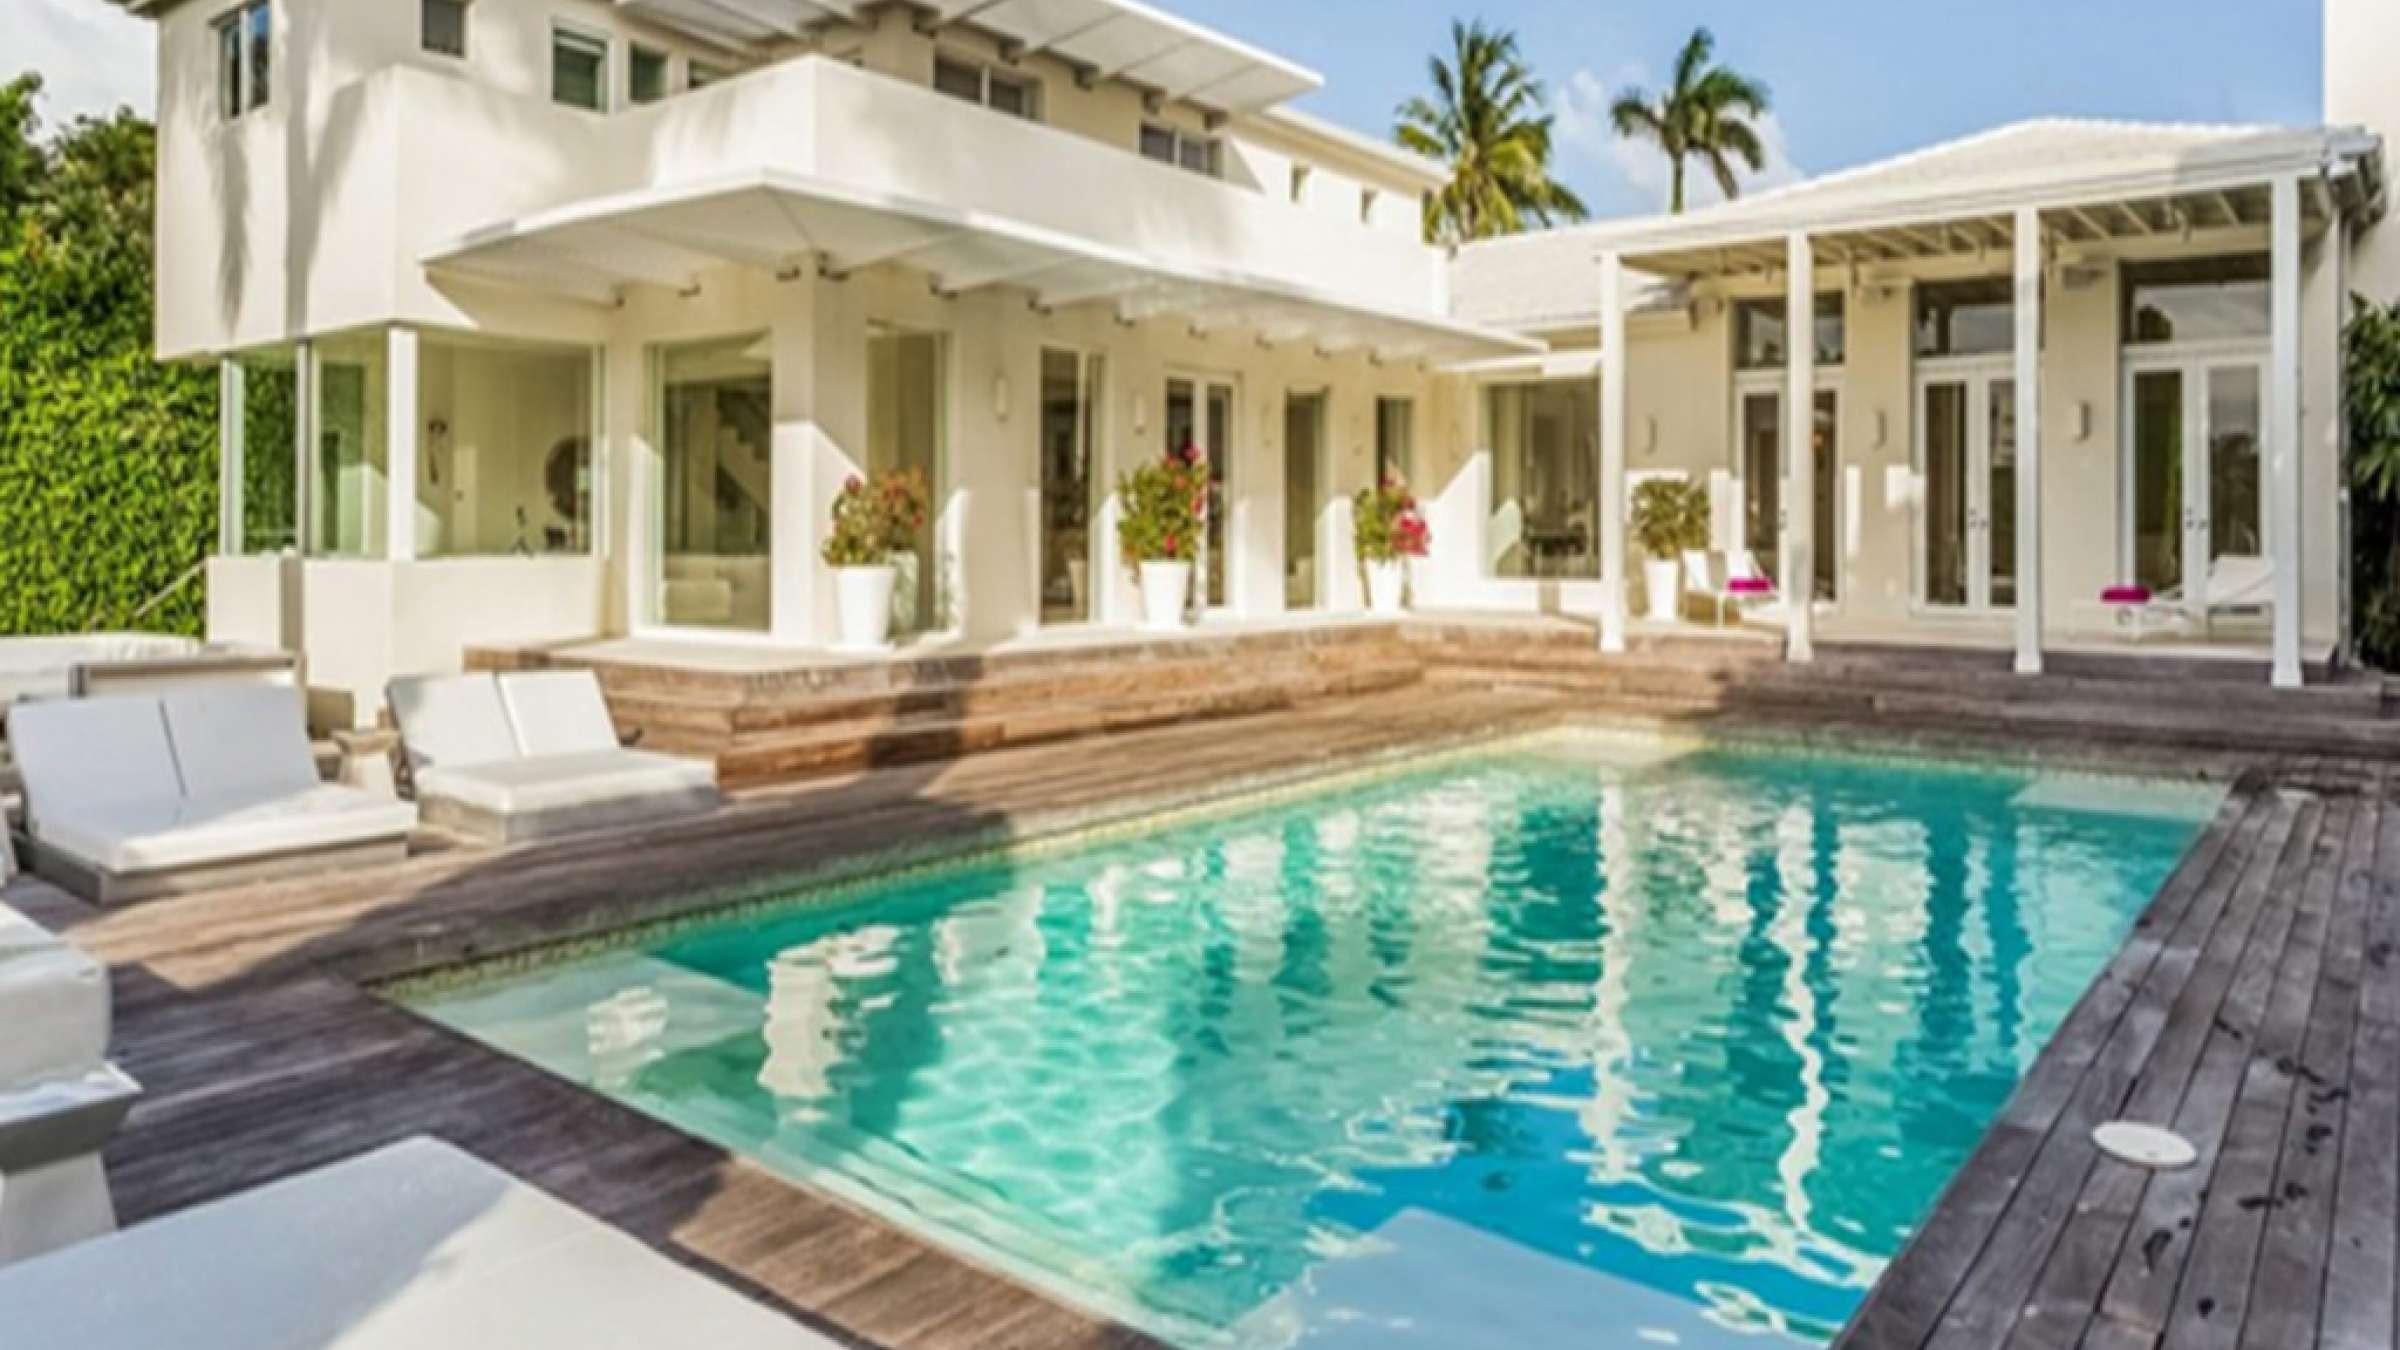 real-estate-solhivand-florida-sood-vam